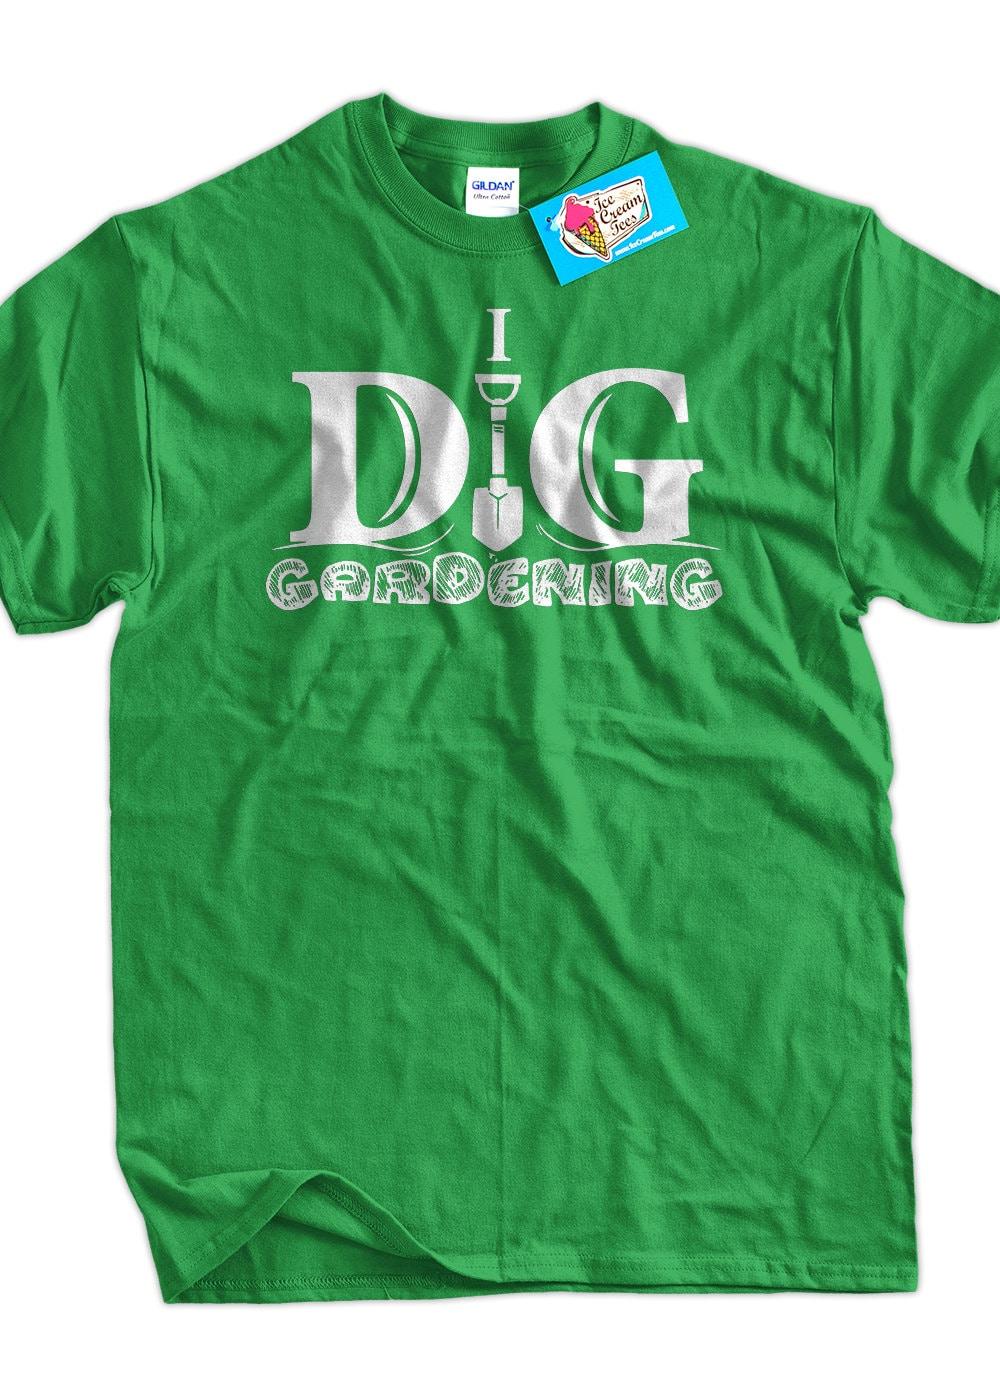 I Dig Gardening T-Shirt Gardening T-Shirt Flower T-Shirt